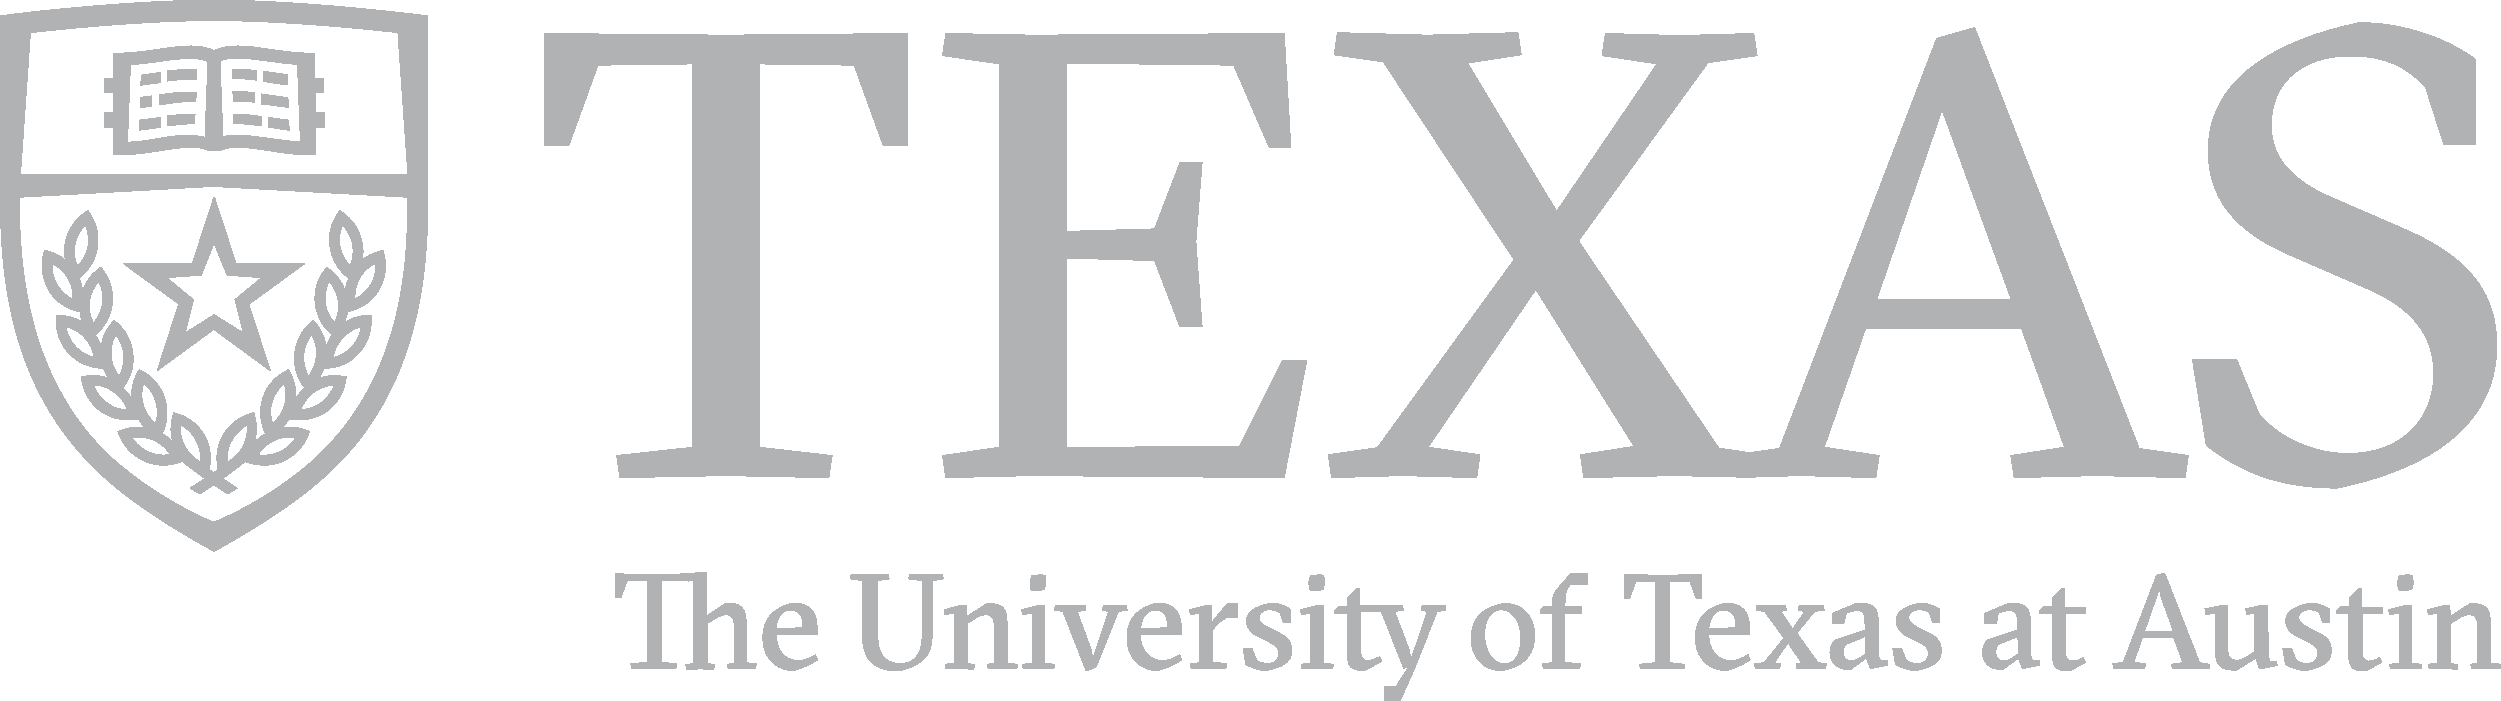 the-university-of-texas-at-austin-logo-vector